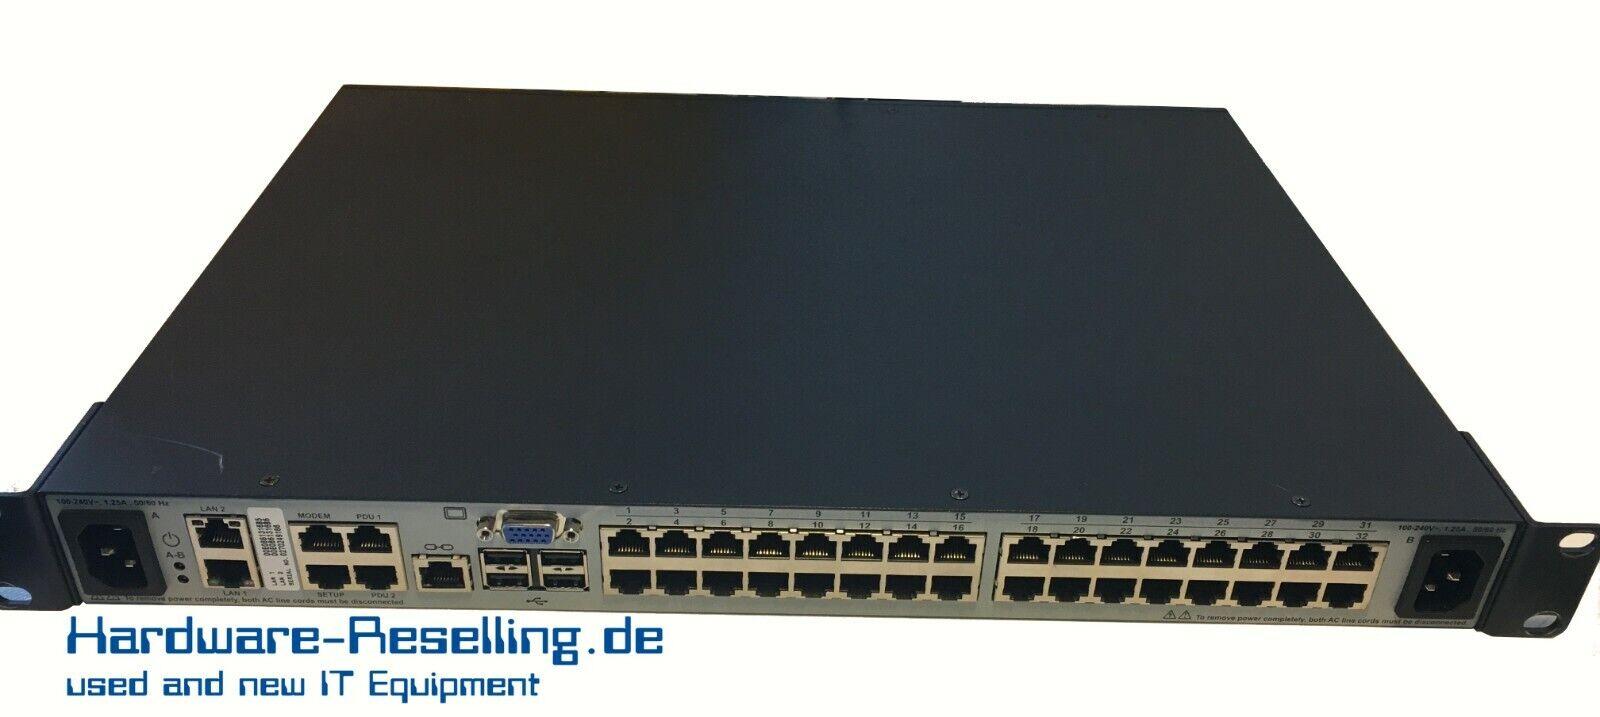 Avocent Mergepoint Unity 4032 MPU4032 32- Port Kvm-Switch SUN Oracle 371-4779-01